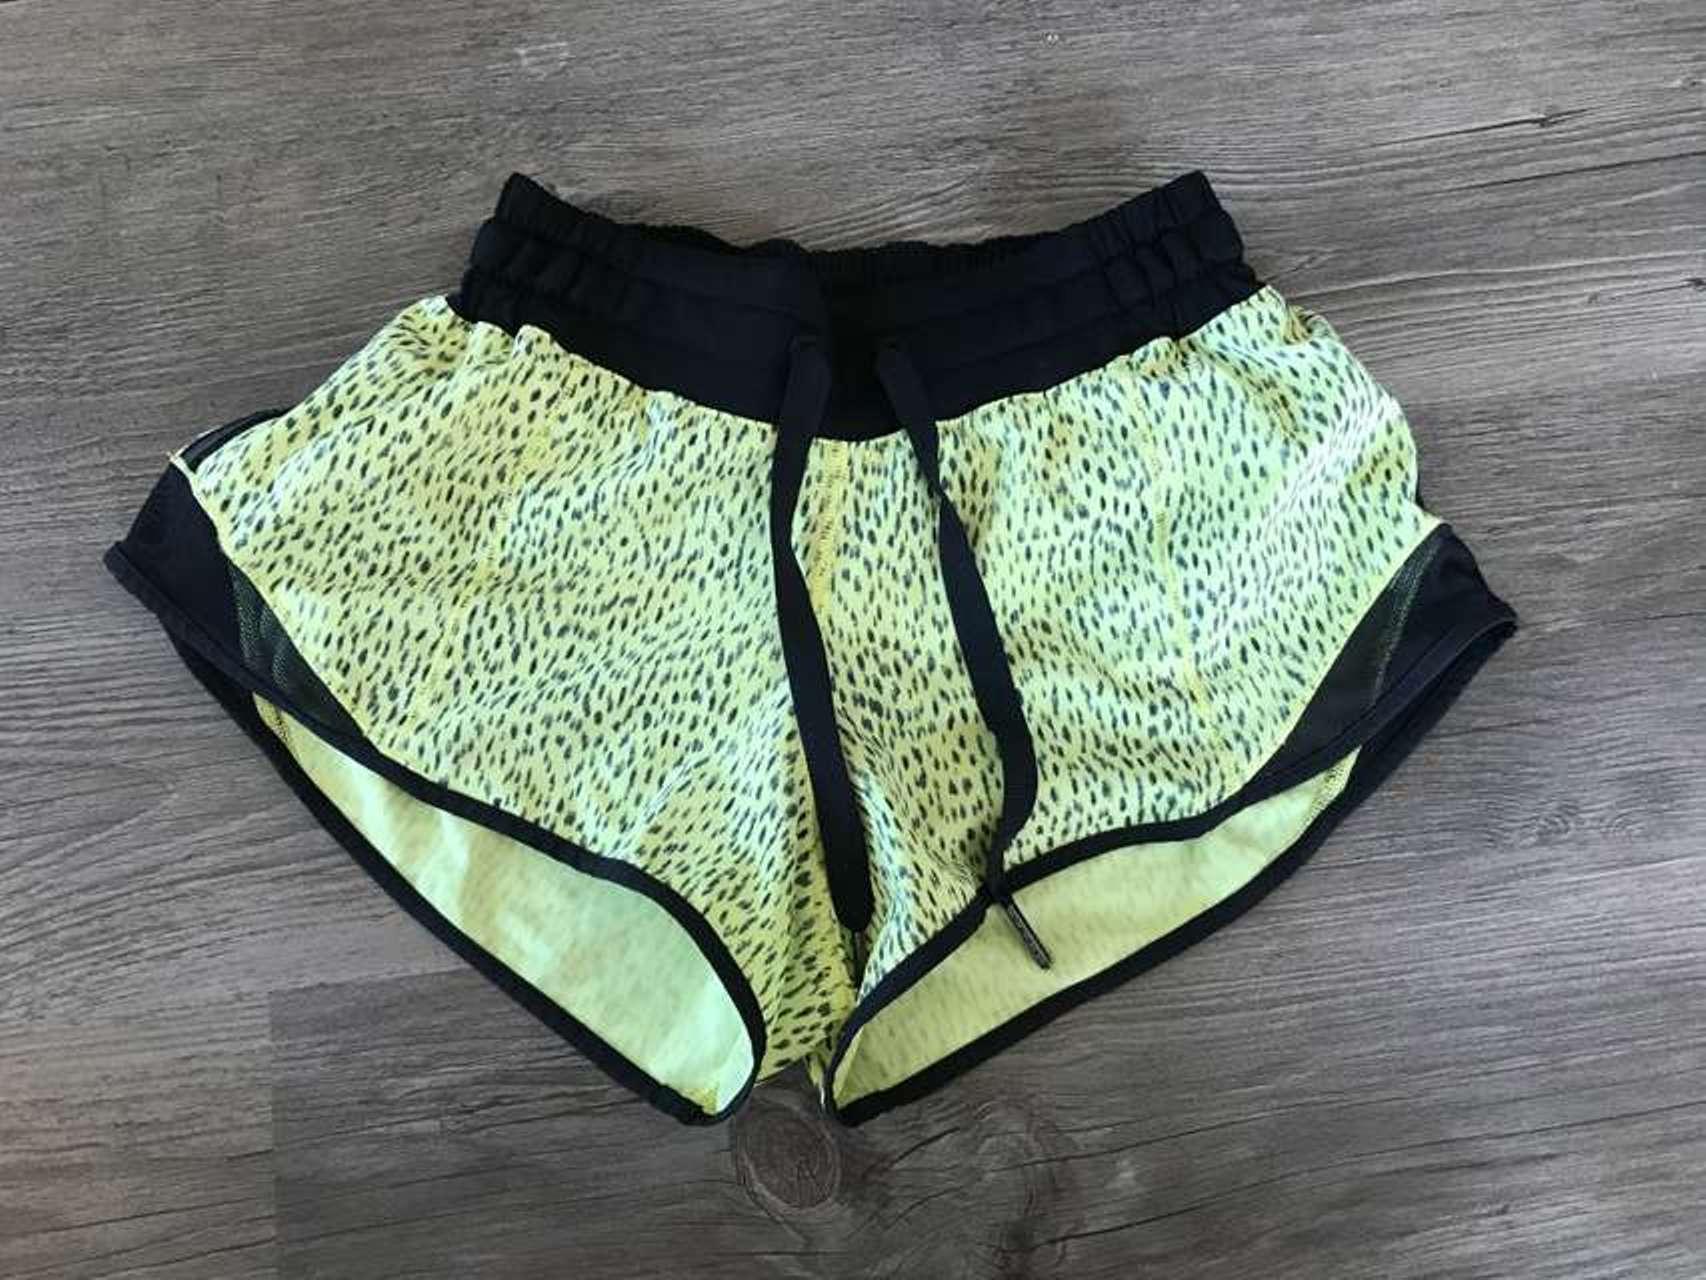 Lululemon Hotty Hot Short - Dottie Dash Clarity Yellow Black / Black